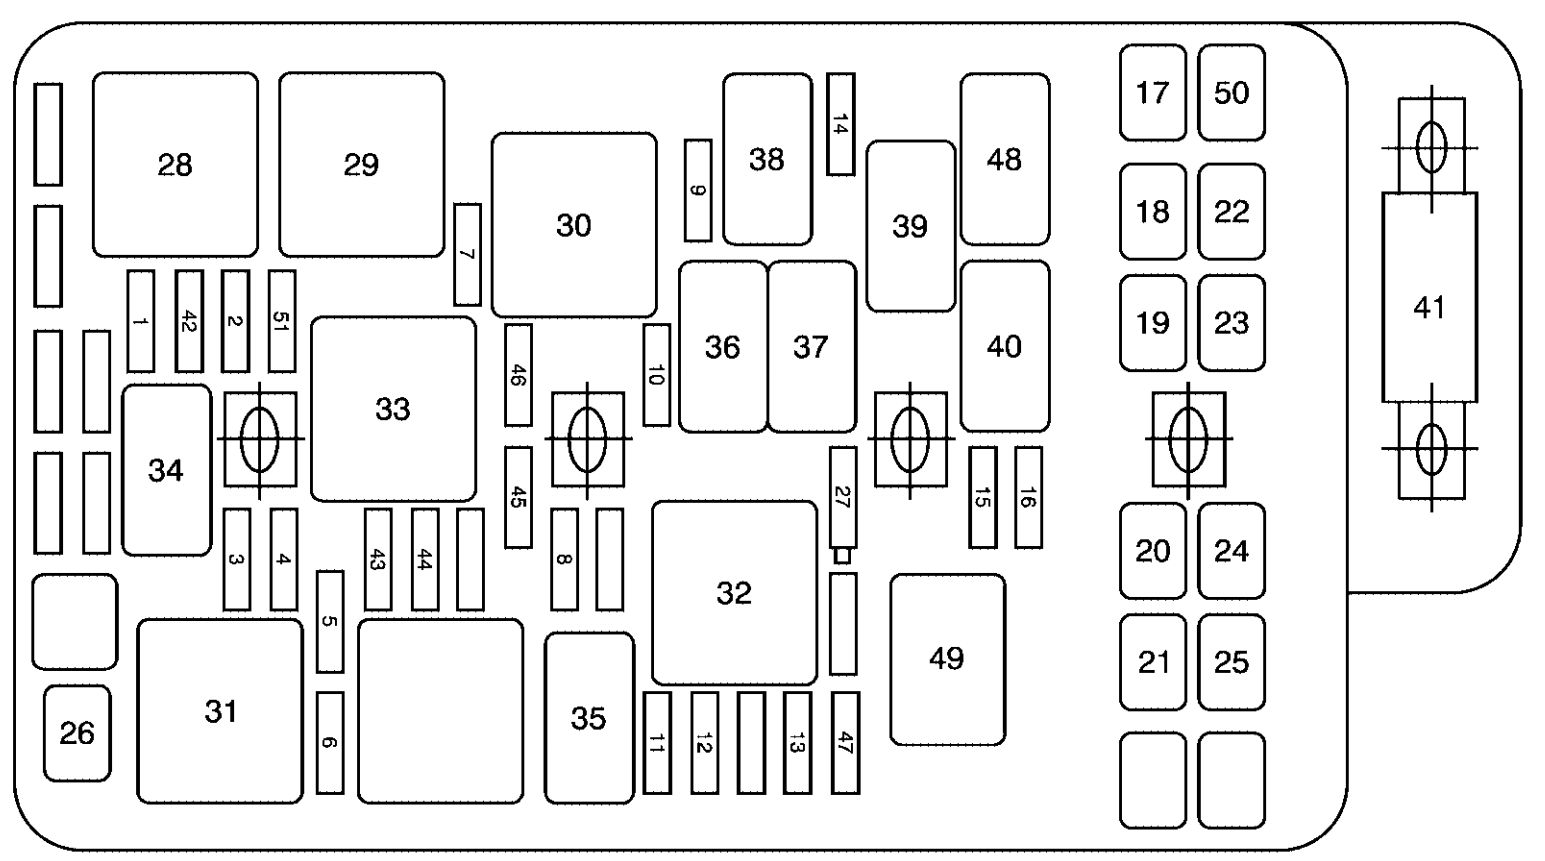 [SCHEMATICS_4ER]  CH_9809] 2007 Pontiac G6 Engine Compartment Fuse Panel Relay And Circuit  Protected Free Diagram | 2007 Pontiac G6 Fuse Box Diagram |  | Ilari Viewor Mohammedshrine Librar Wiring 101